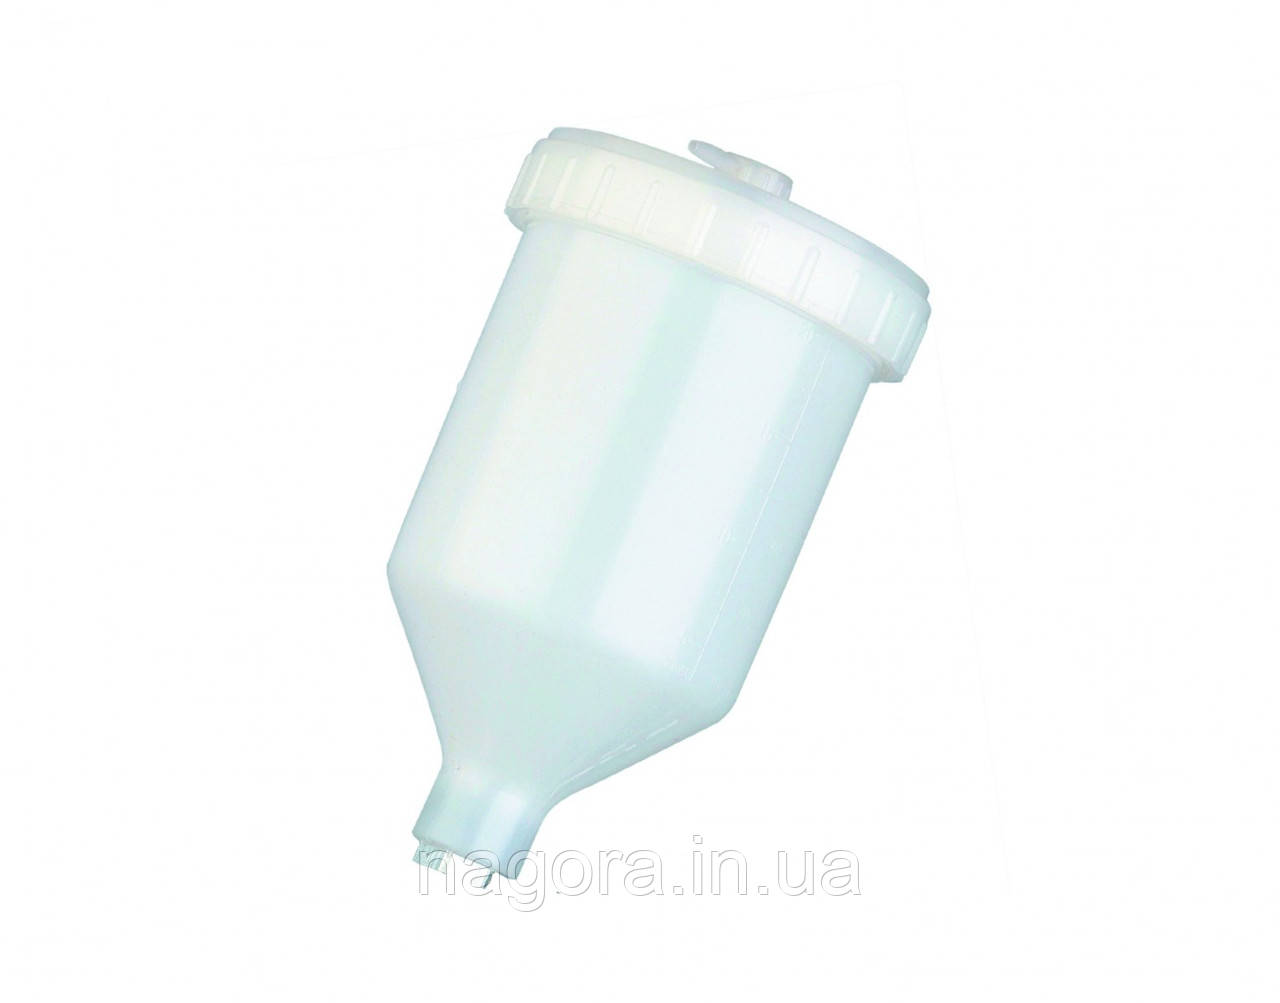 SATA Пластиковий бачок 0,125 л для SATAminijet 3000 B HVLP, minijet 4 HVLP